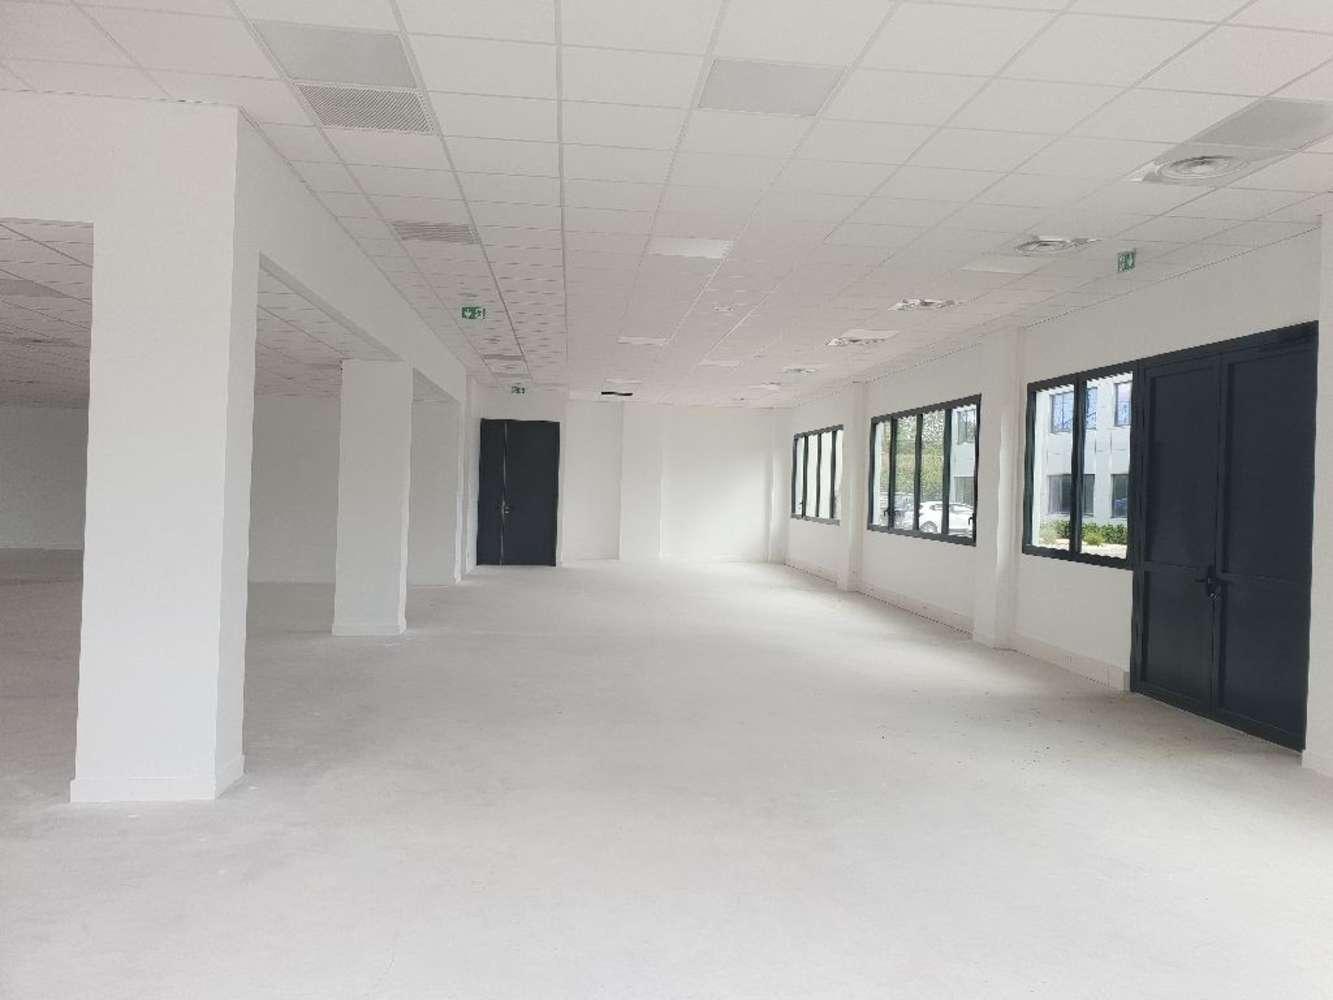 Bureaux Lyon, 69007 - GERLAND TECHNOPARK II : Phase 2 - Mixte - 10374525